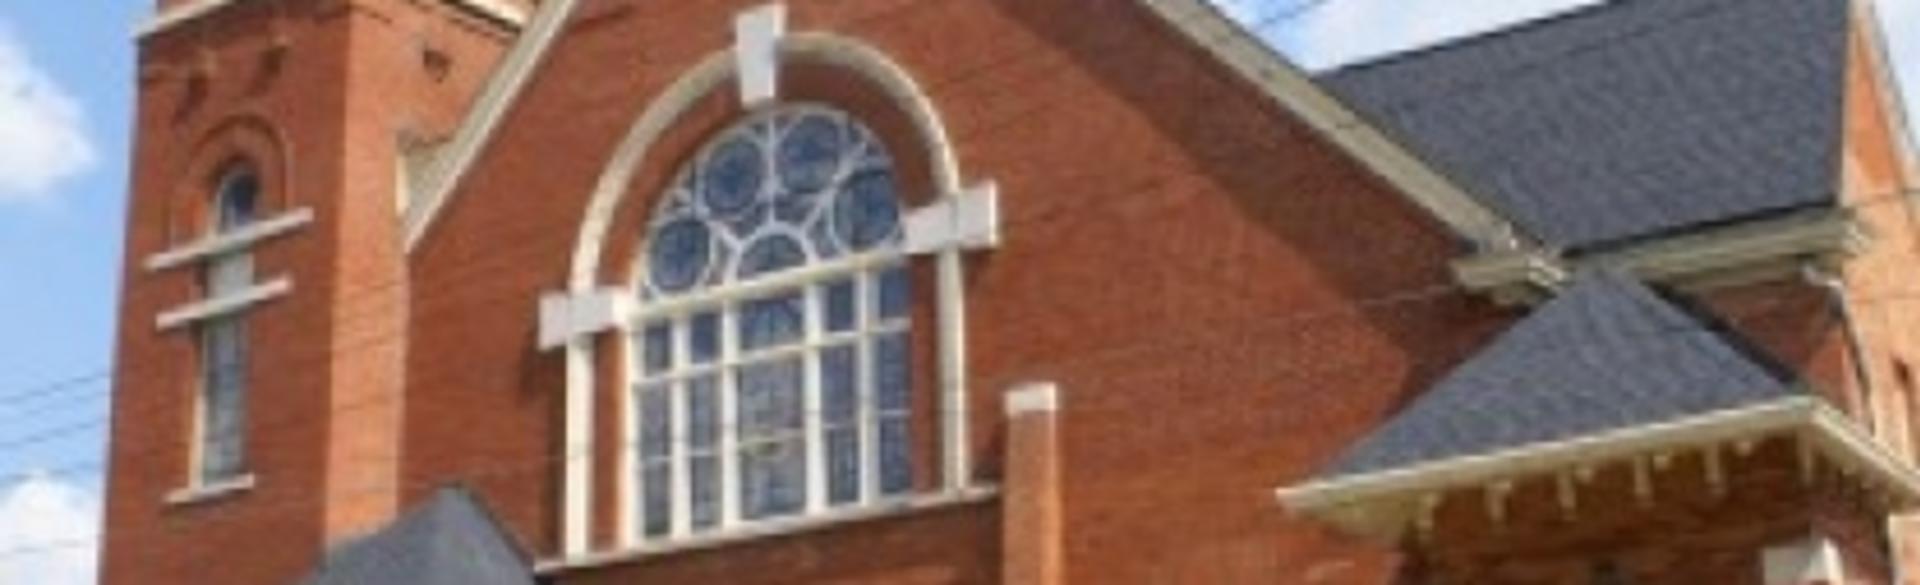 City View Church